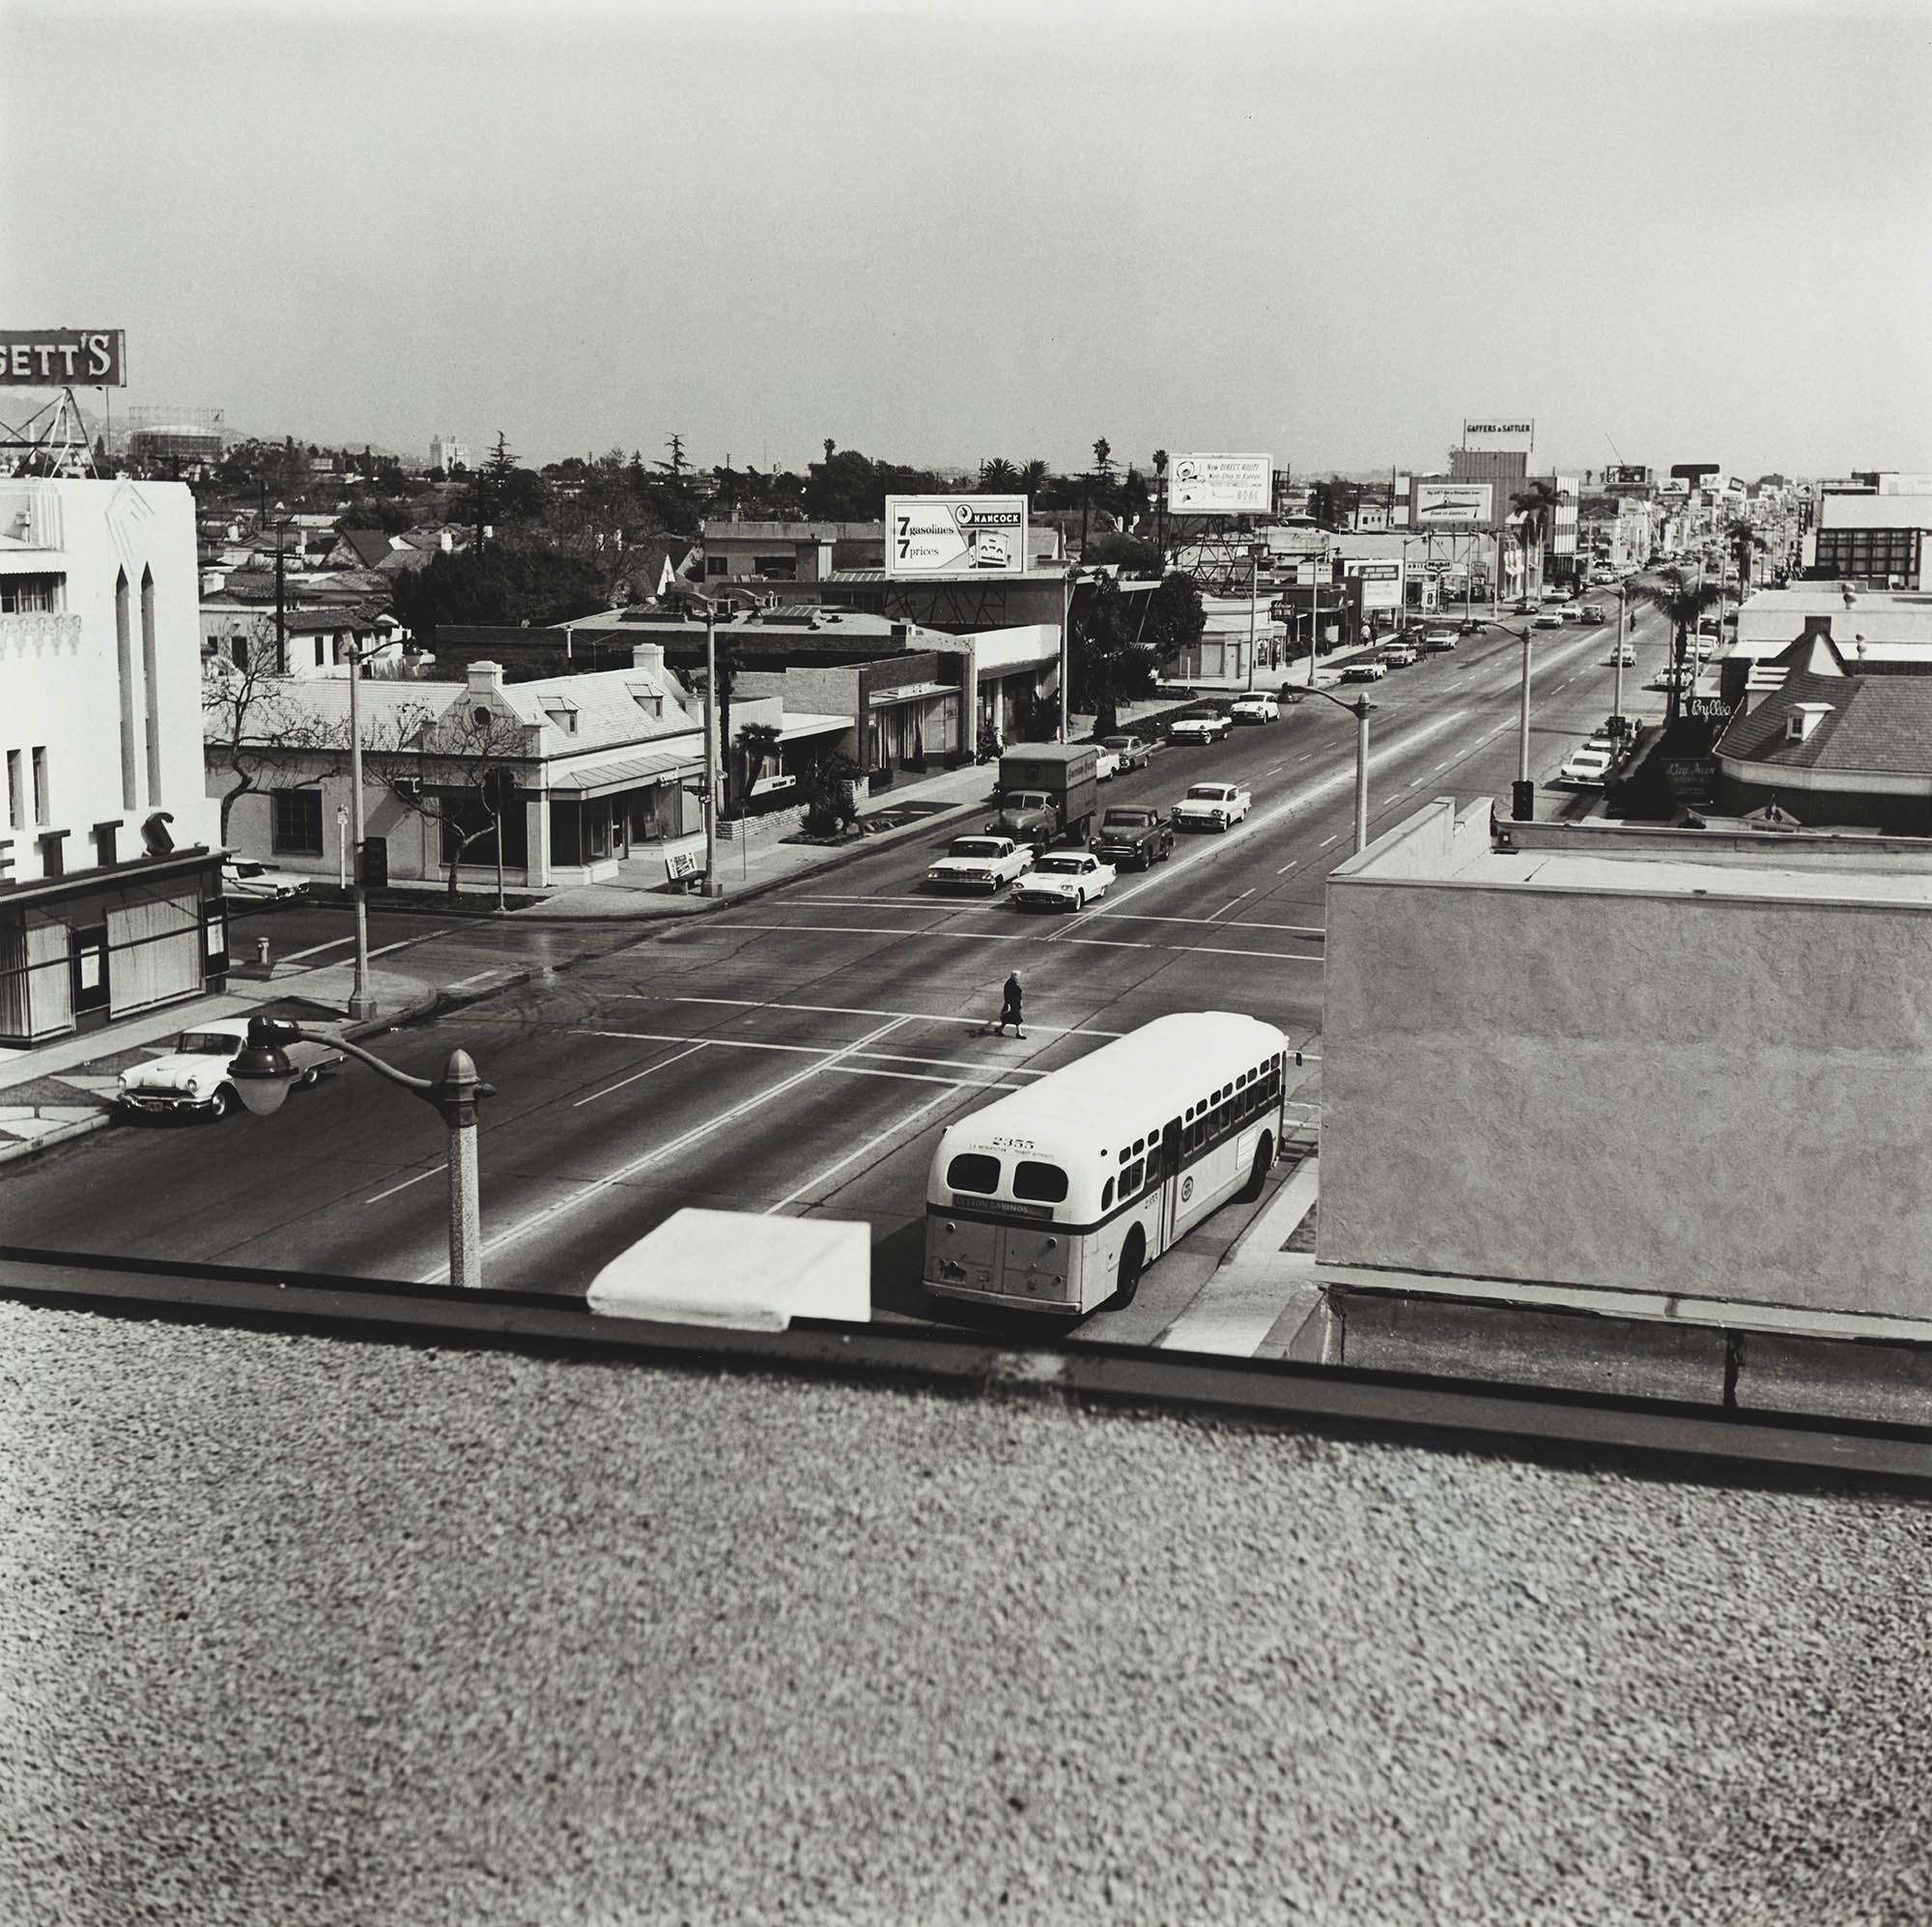 Ed Ruscha, Rooftops, 1961